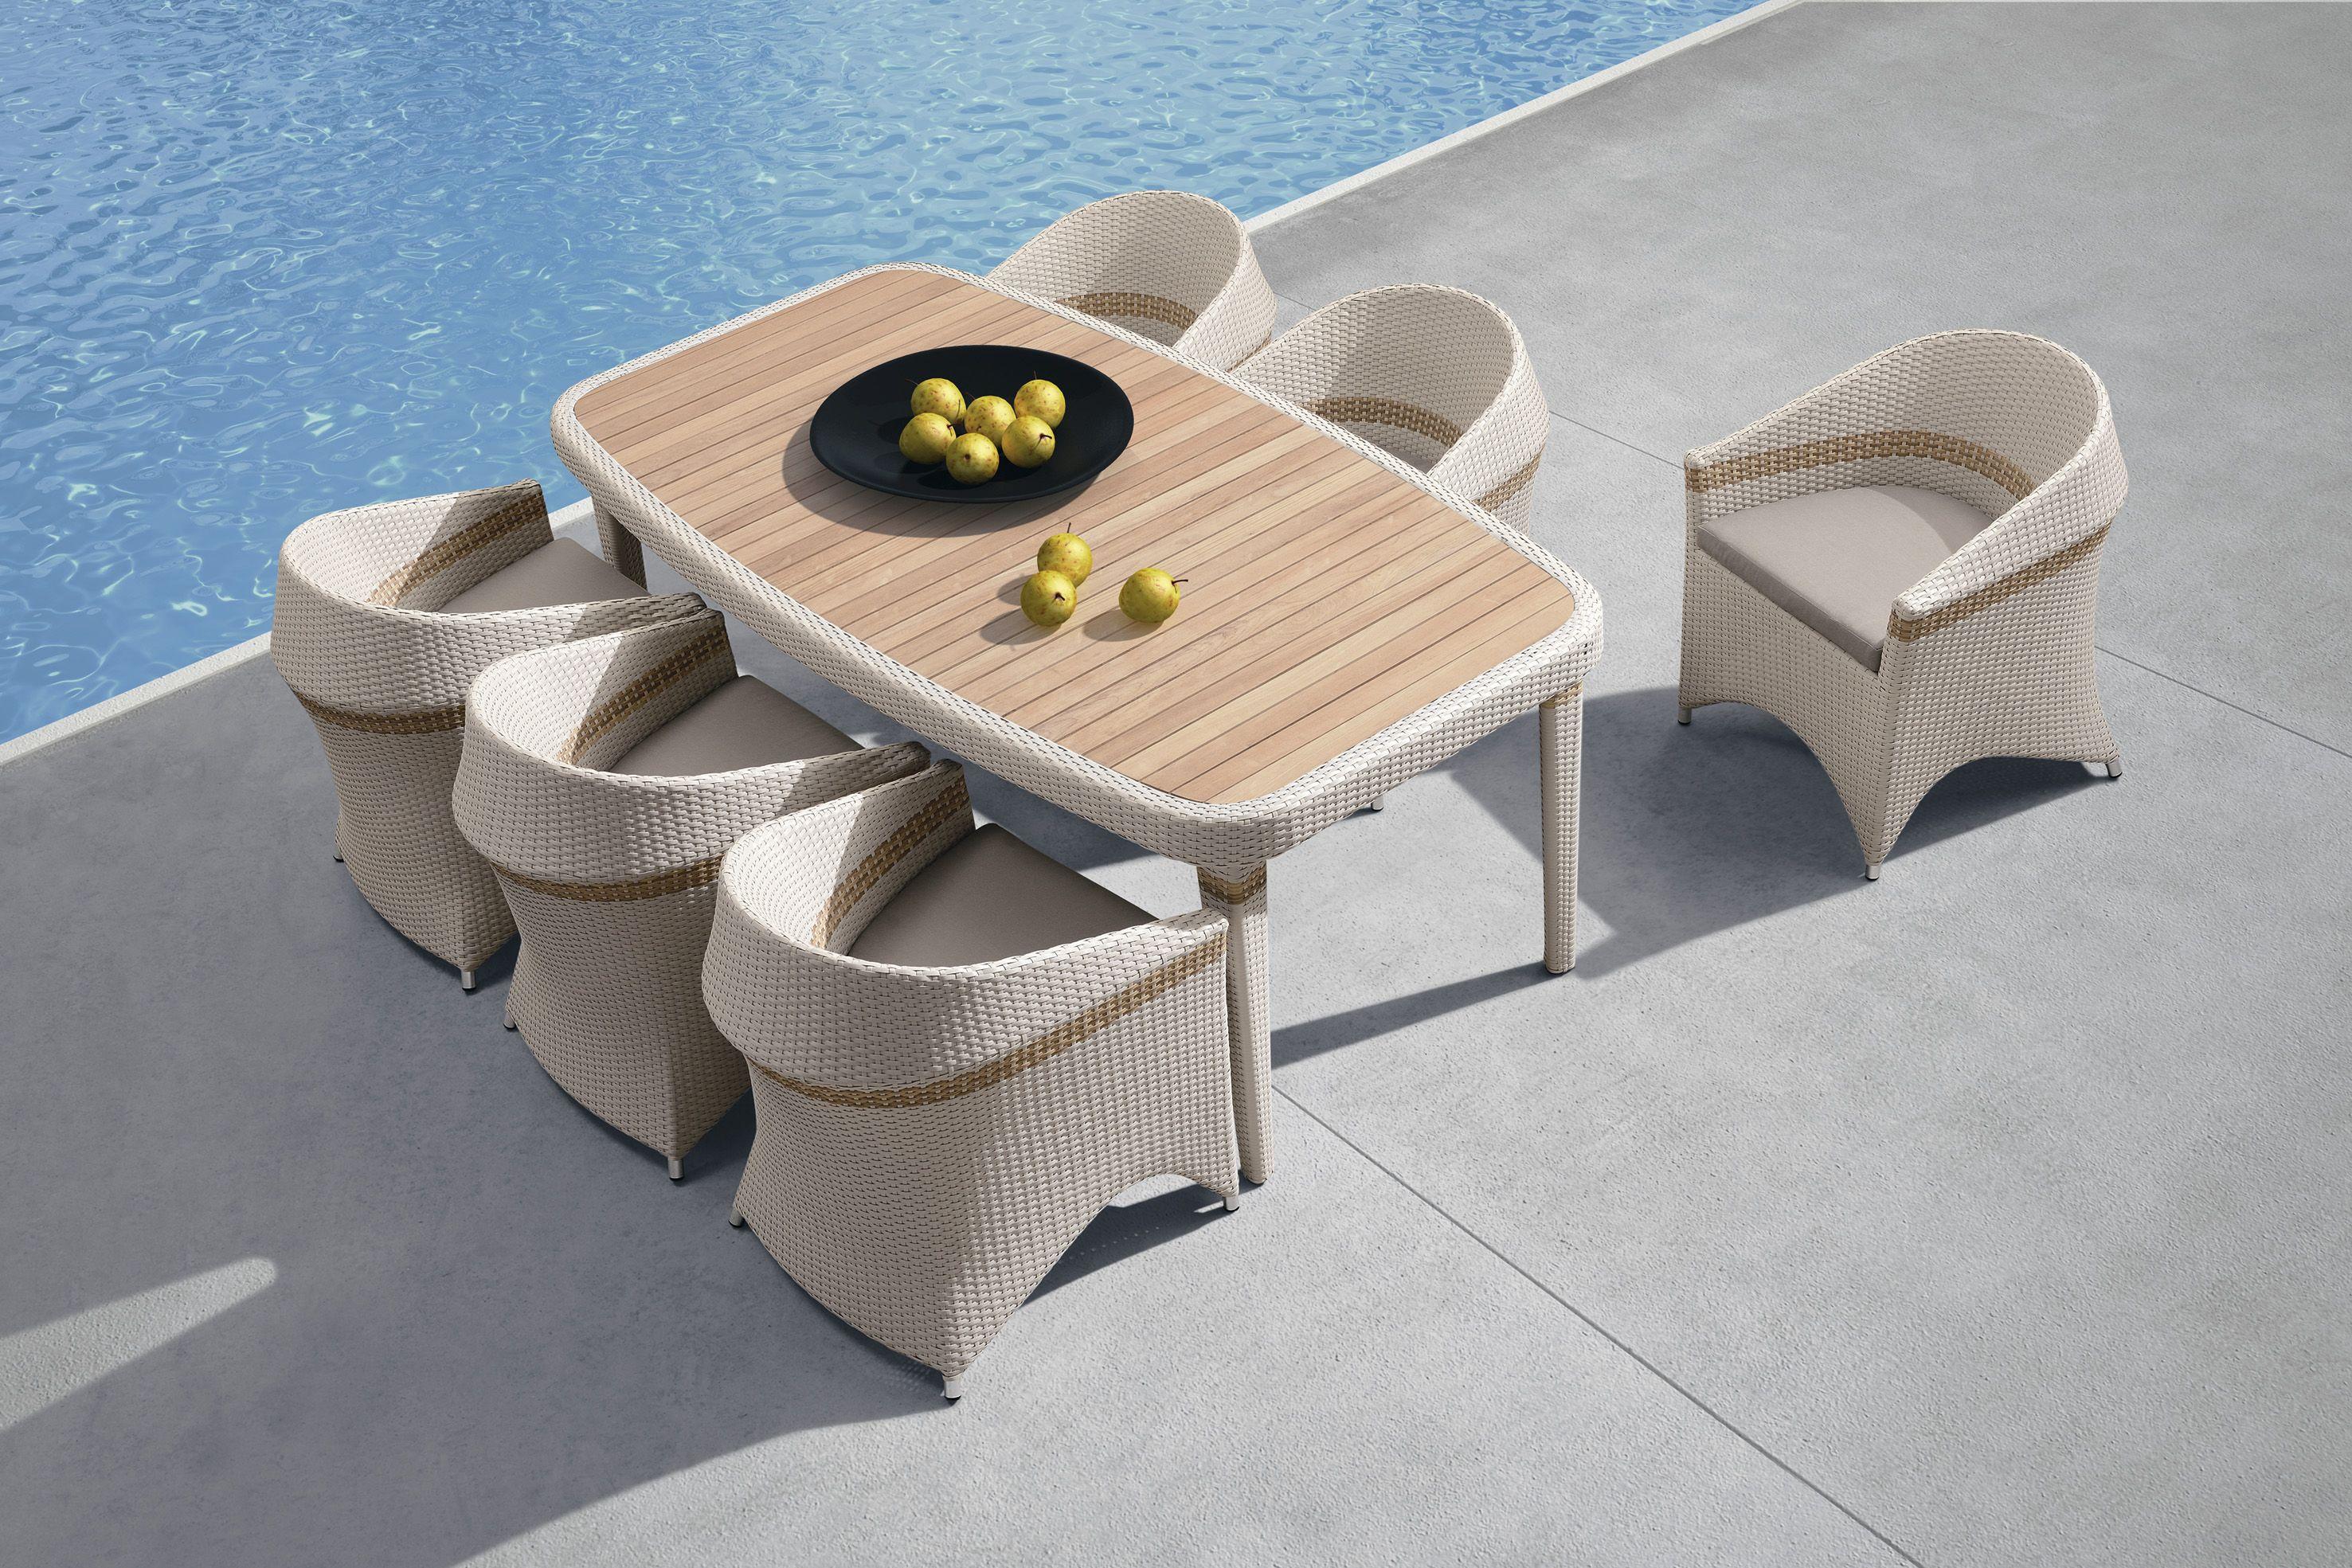 eda7b516c543e782f96f060d7c16df78 Luxe De Salon Jardin Rotin Concept